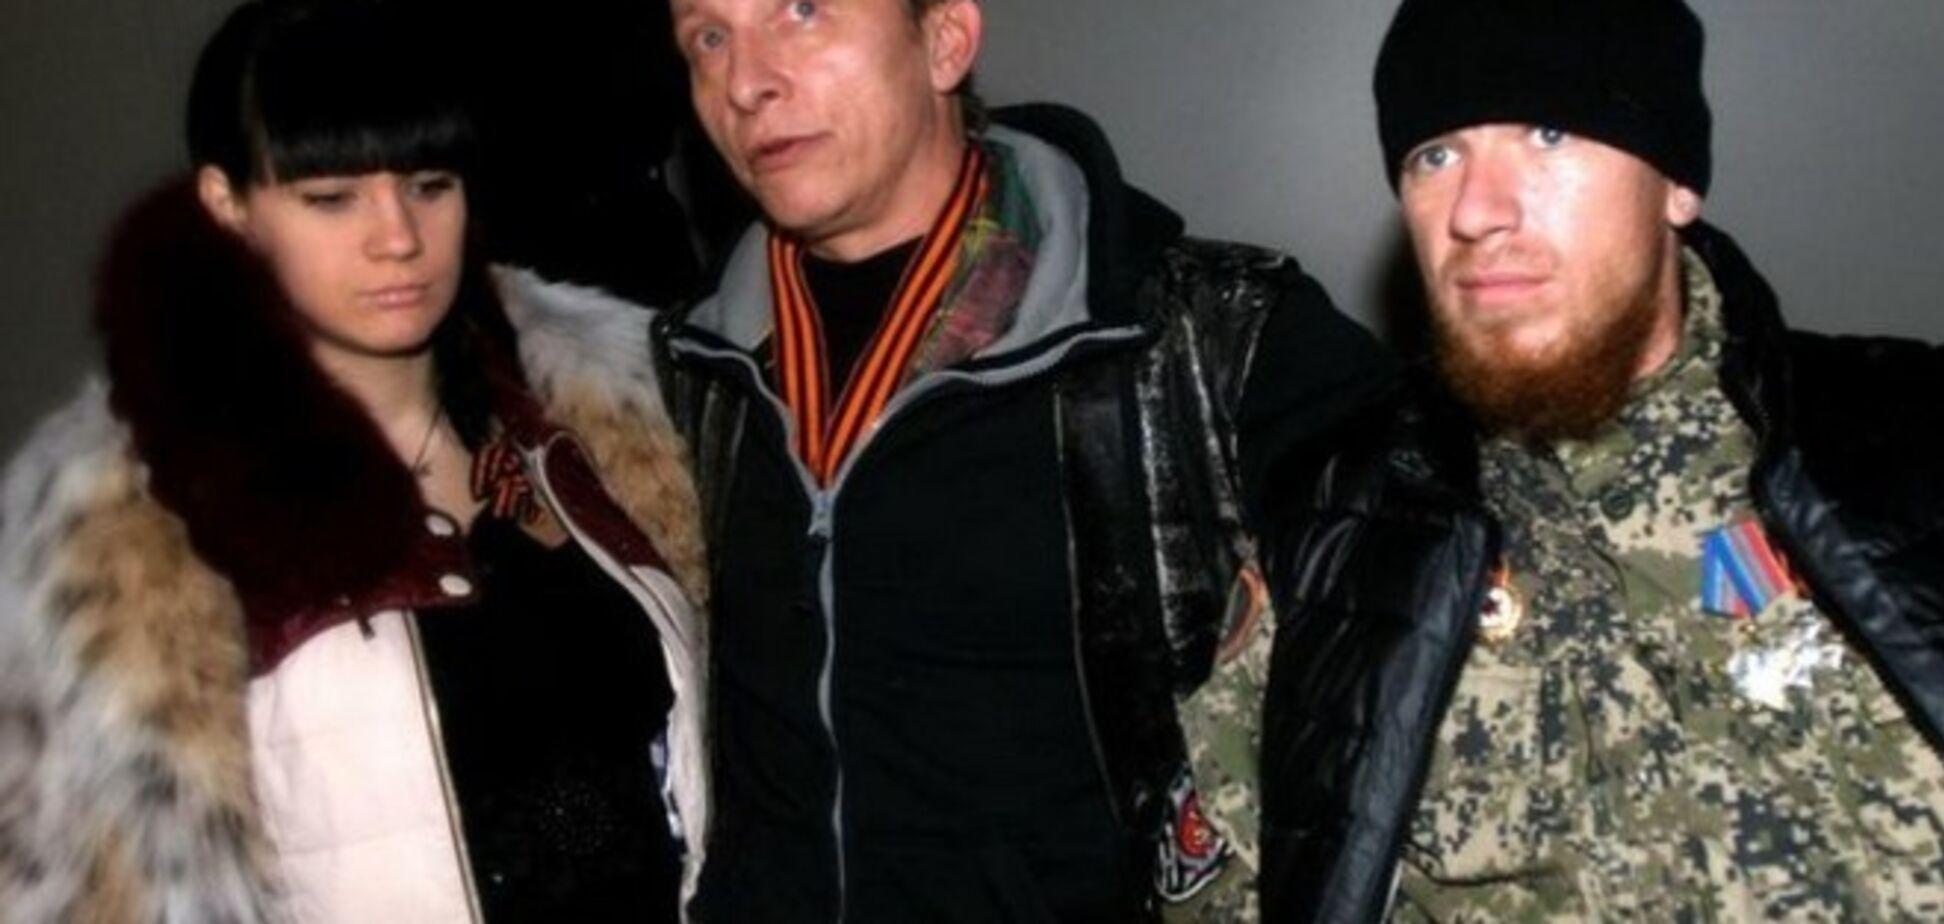 Зима русского мира. Путинских клоунов зазнобило…